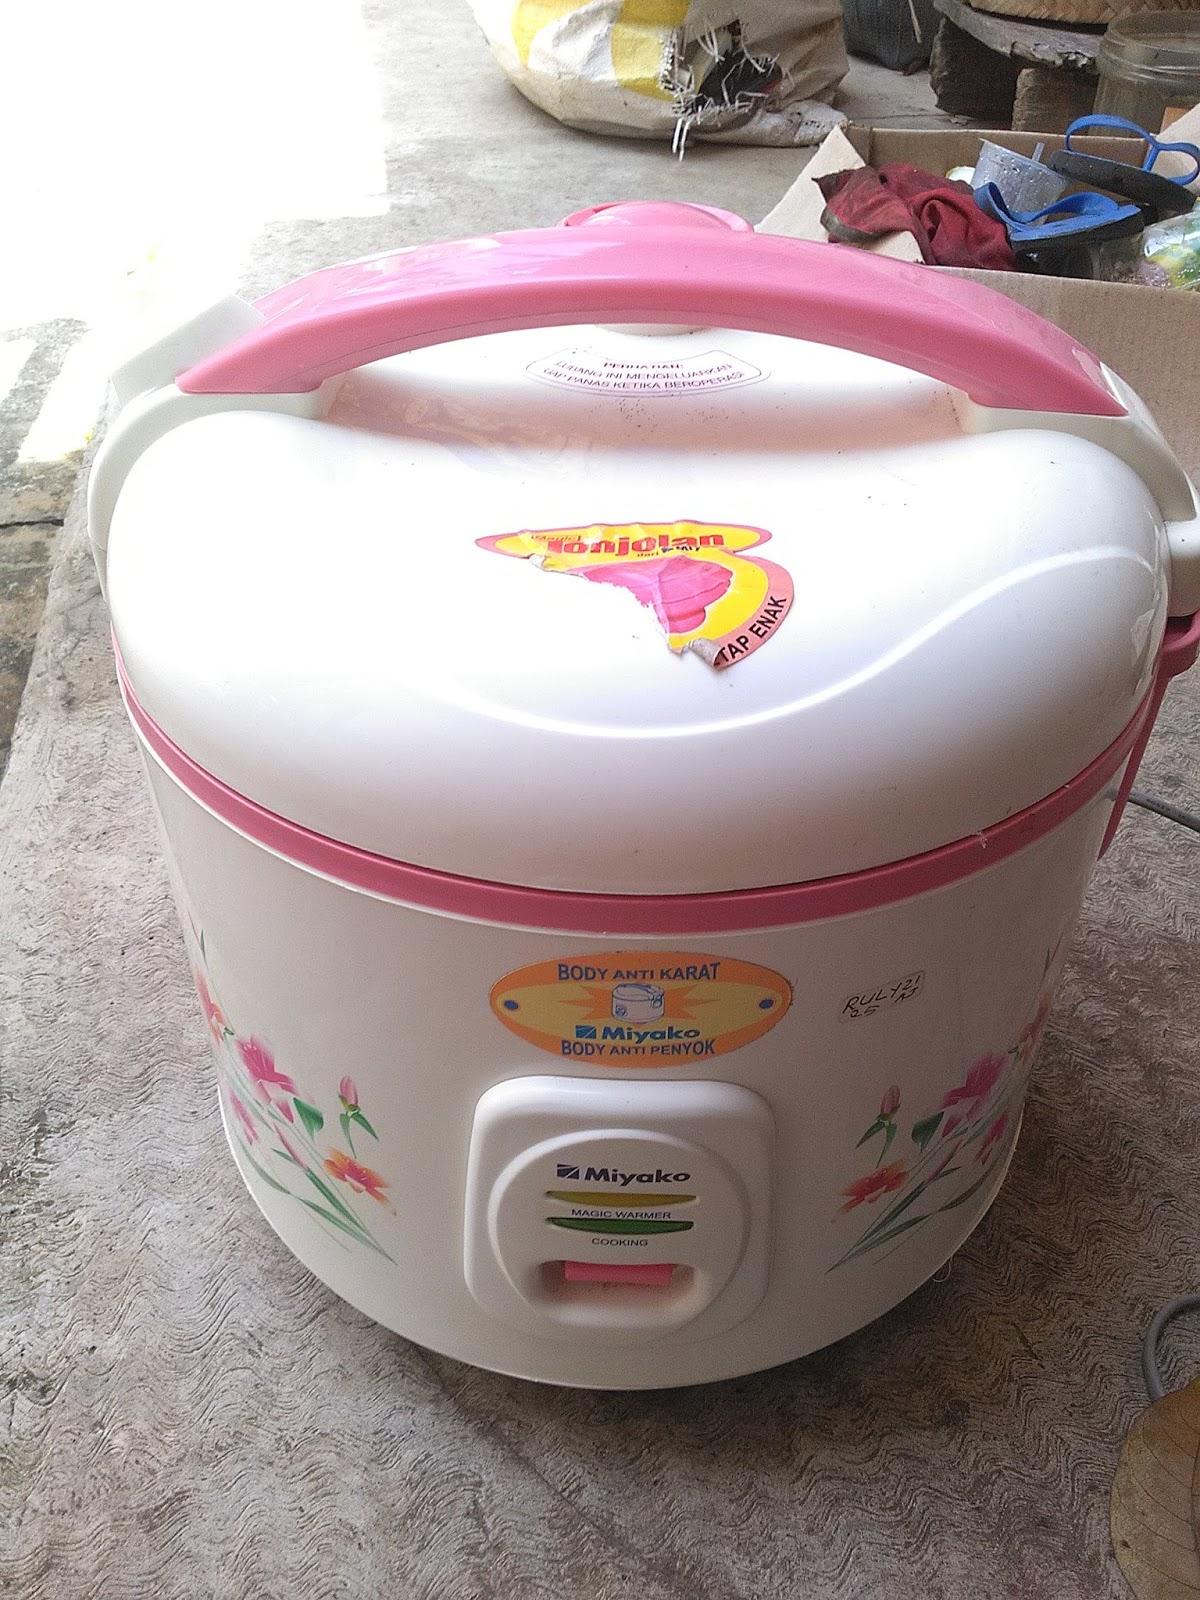 ZAPT777: Tips: Cara Mengatasi Otomatis Rice Cooker Tidak ...